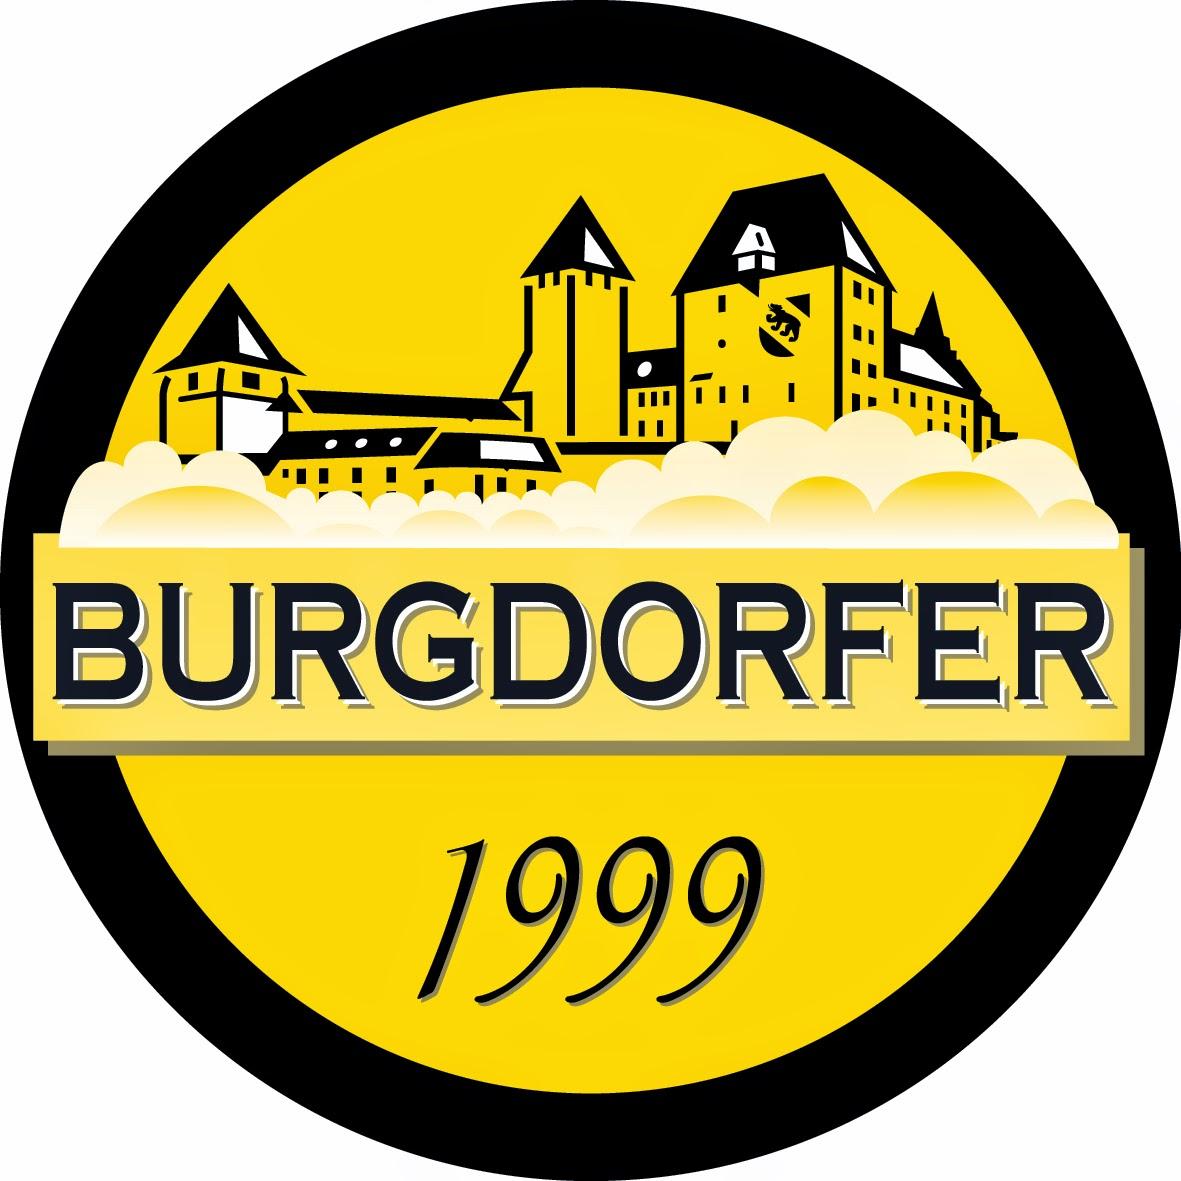 burgdorfer logo